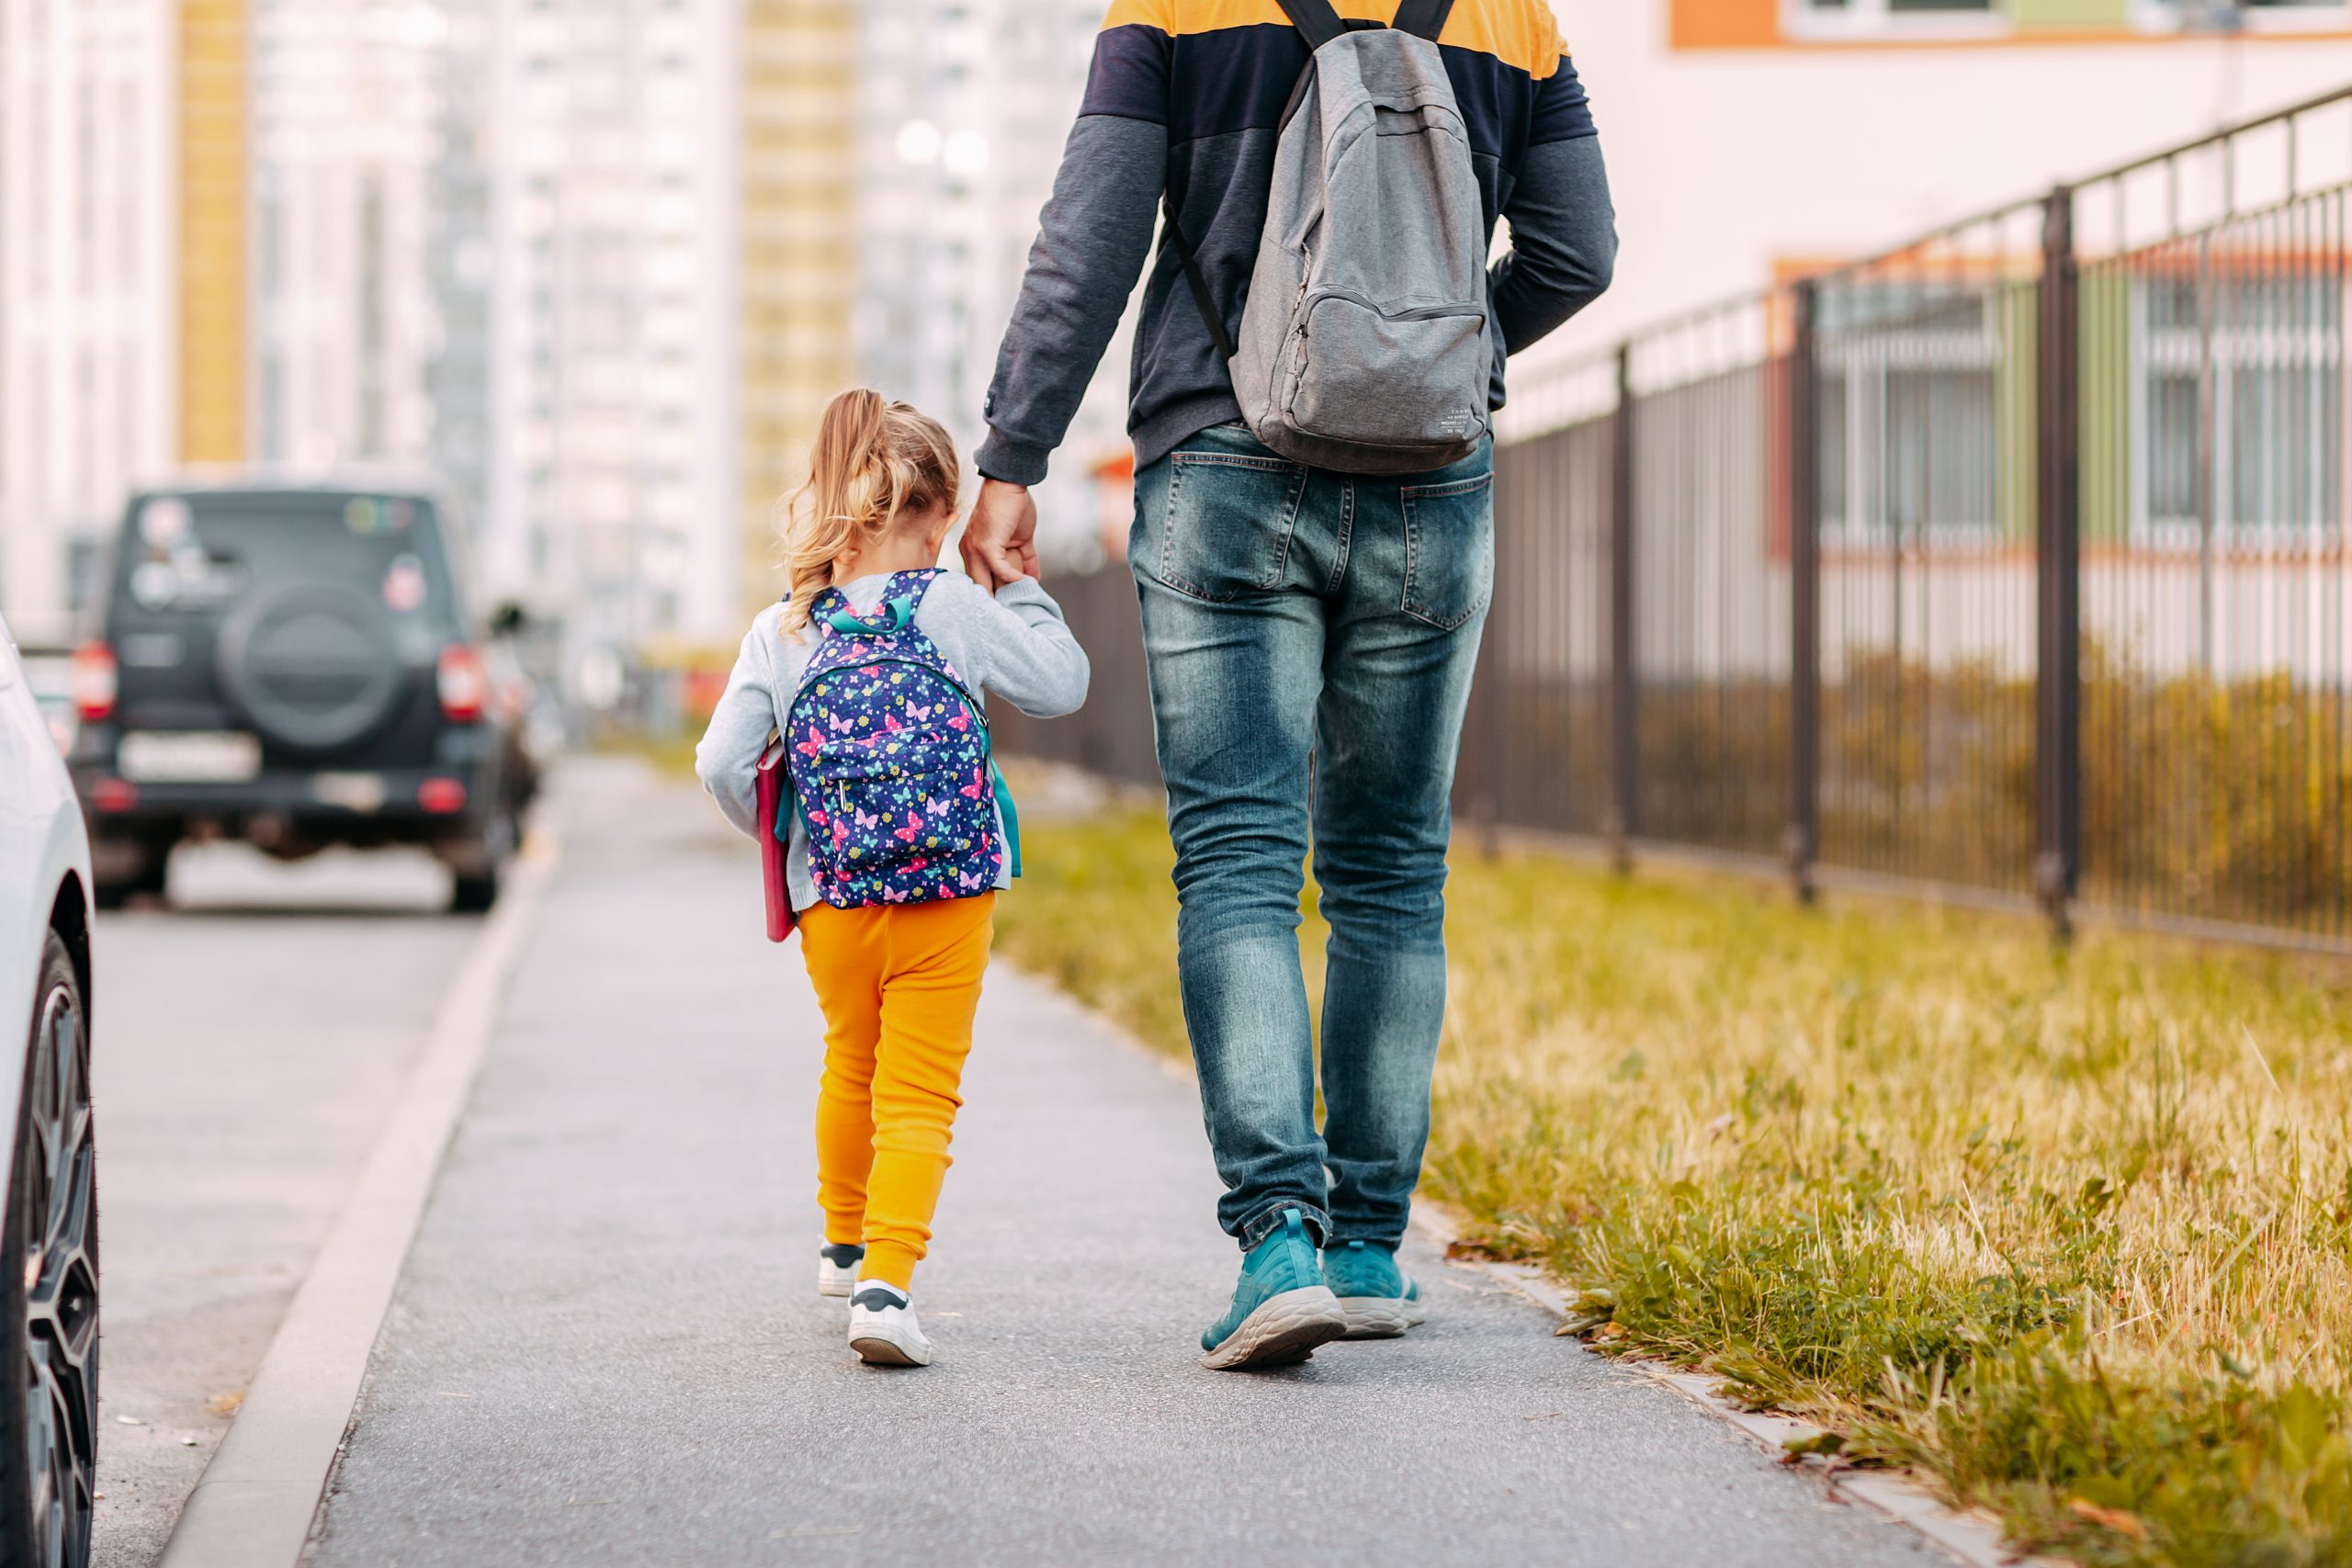 Starting Preschool – The Big Transition